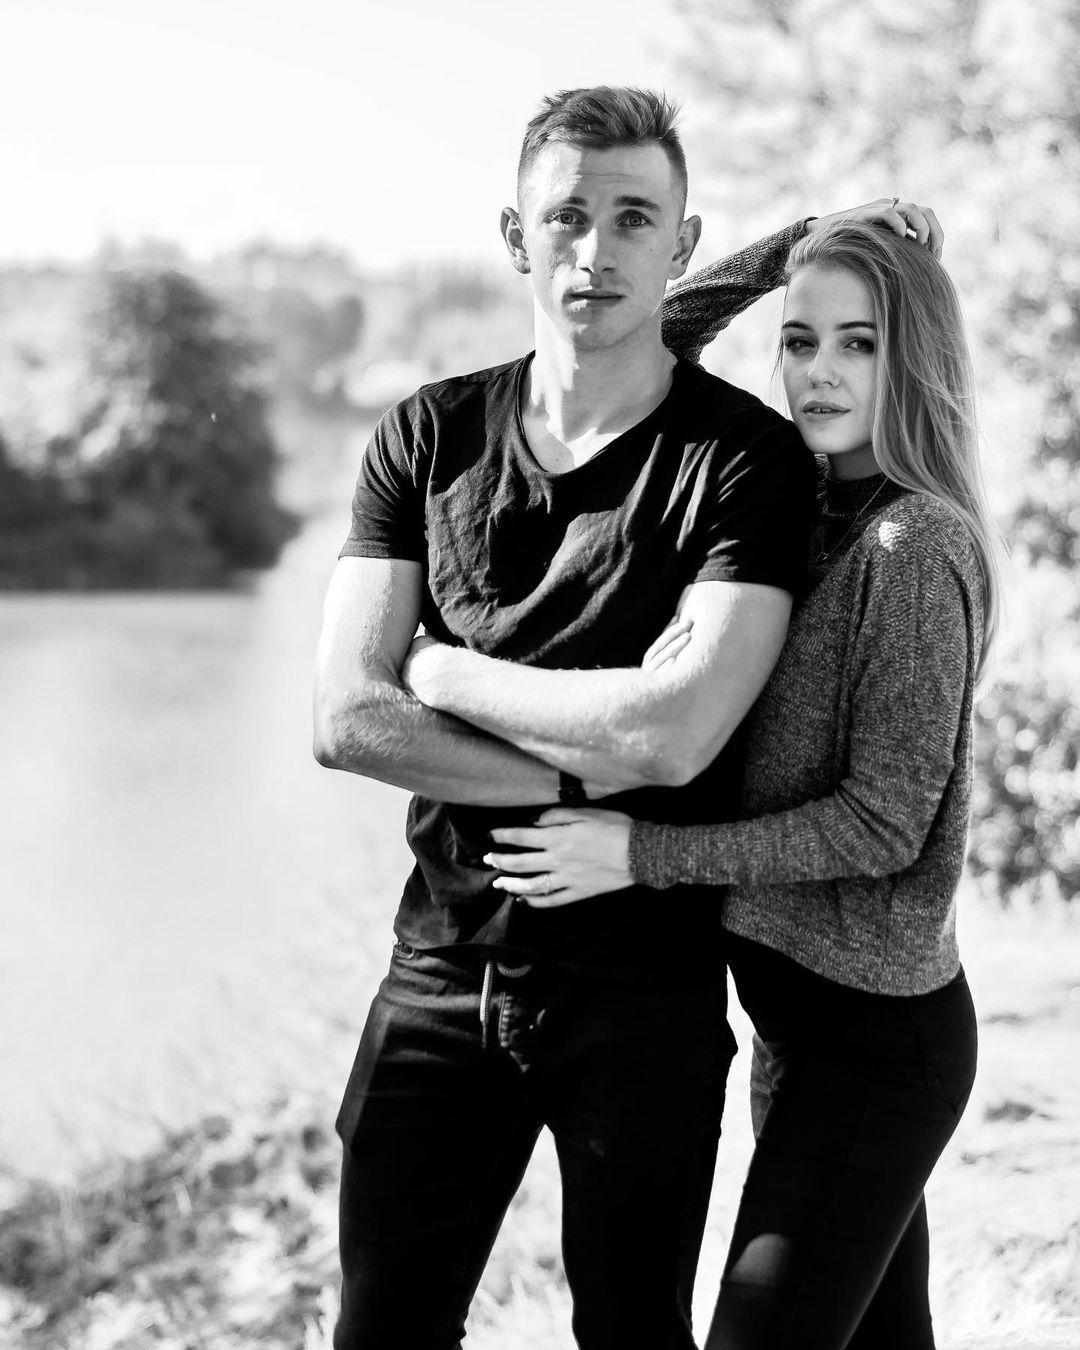 Анастасия Сидоренко и Богдан Цымбал